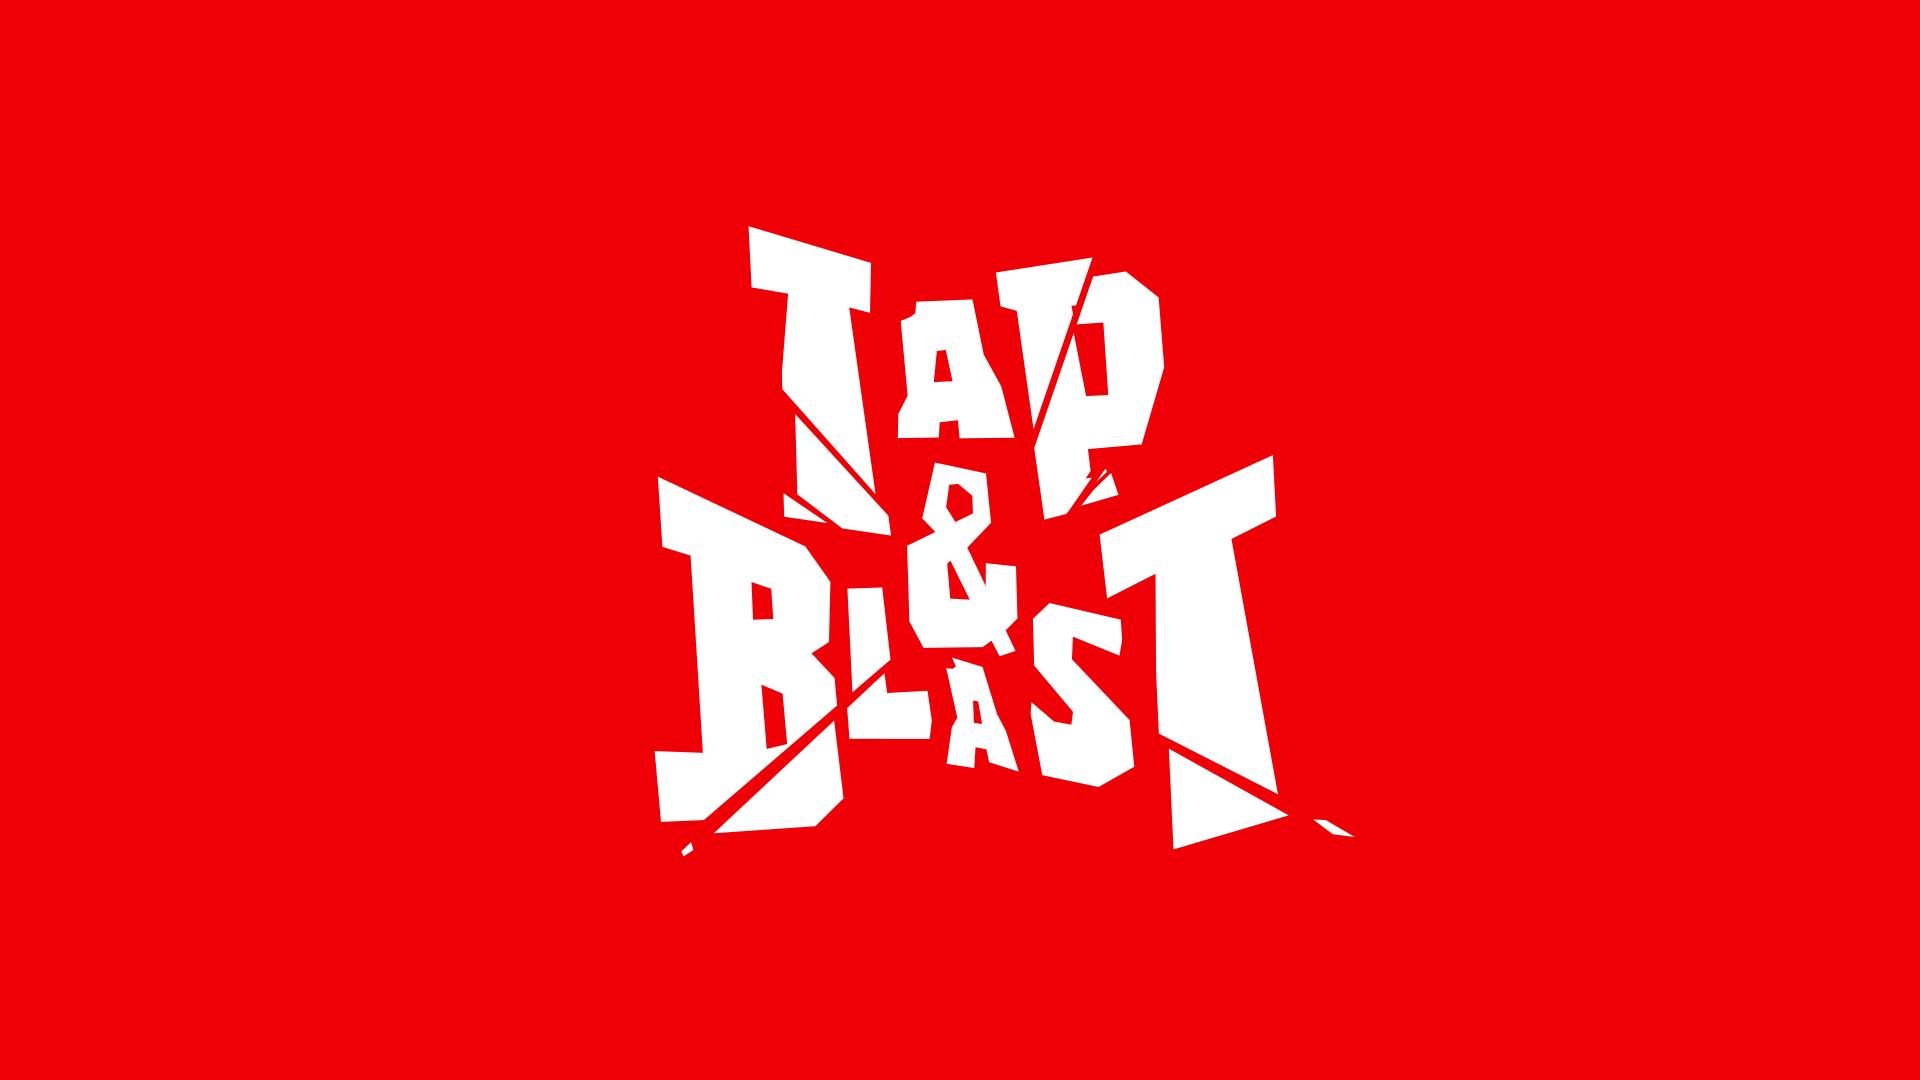 Tap & Blast is LIVE!